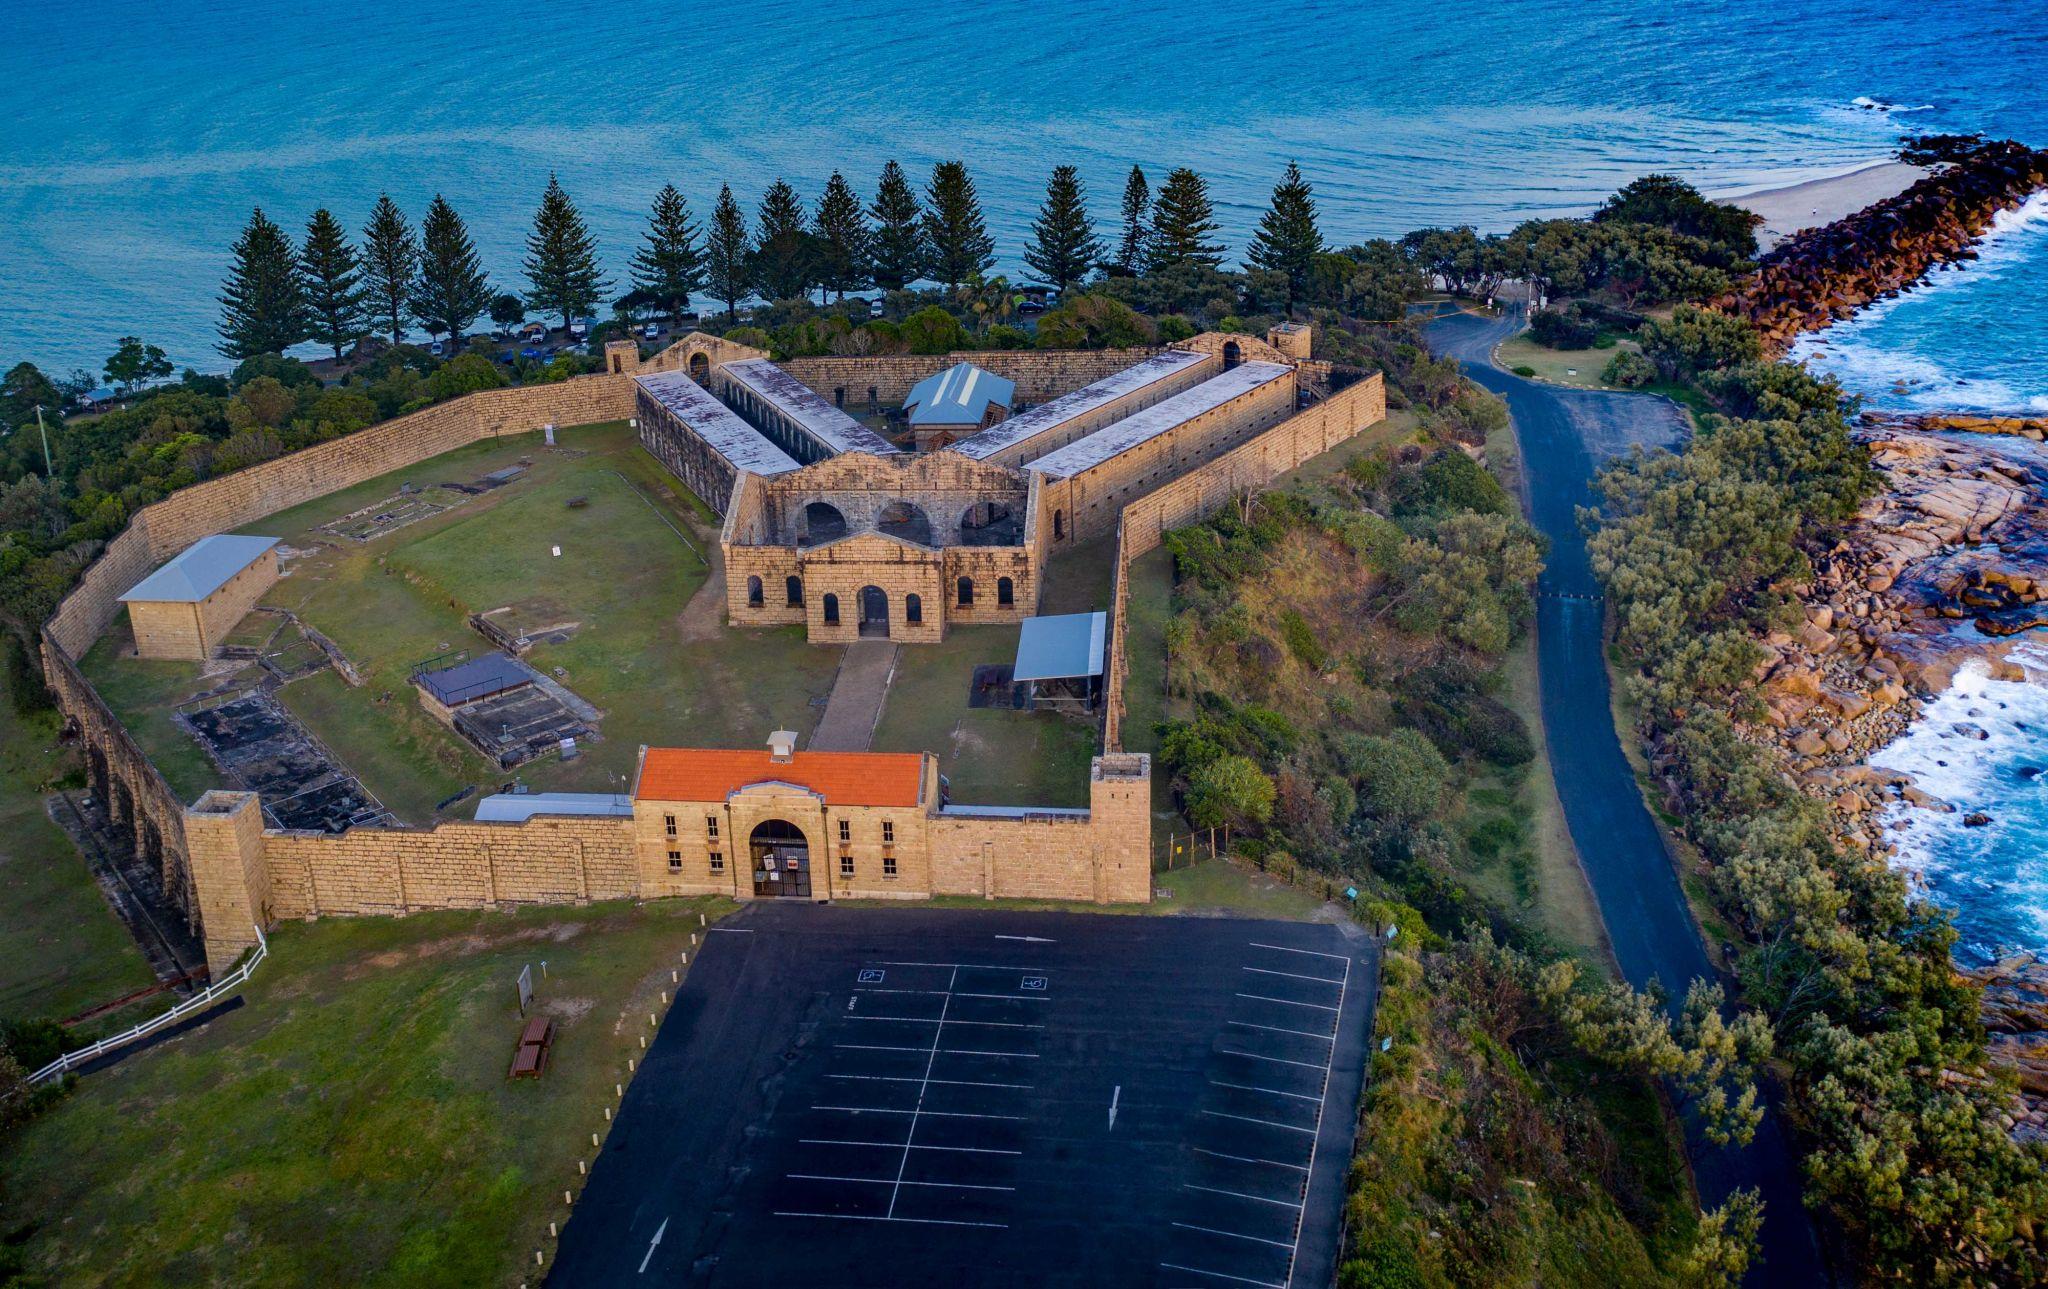 Trial Bay Gaol Drone South West Rocks New South Wales, Australia